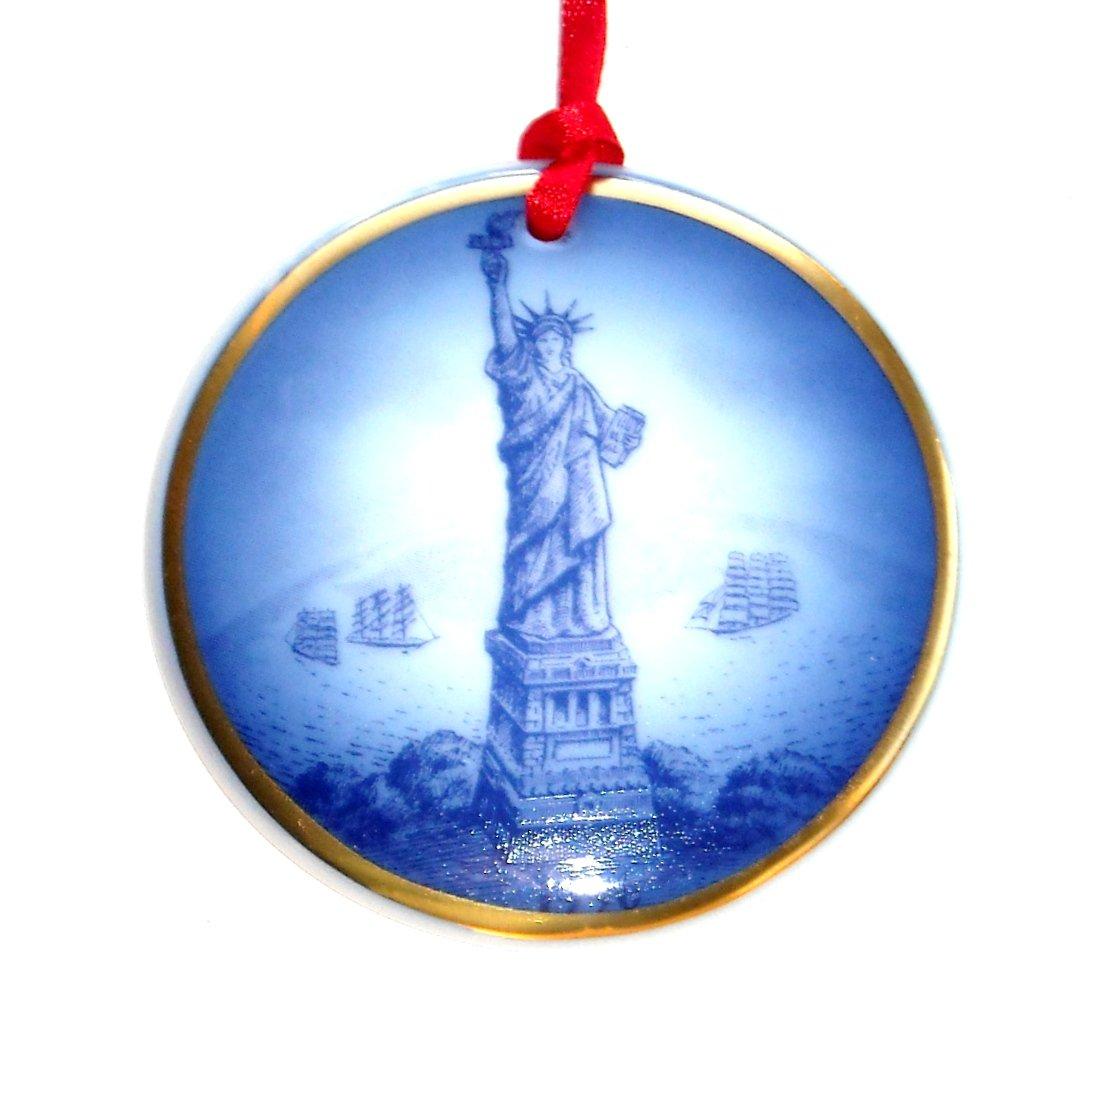 Bing & Grondahl Copenhagen American Christmas Heritage Ornament 1996